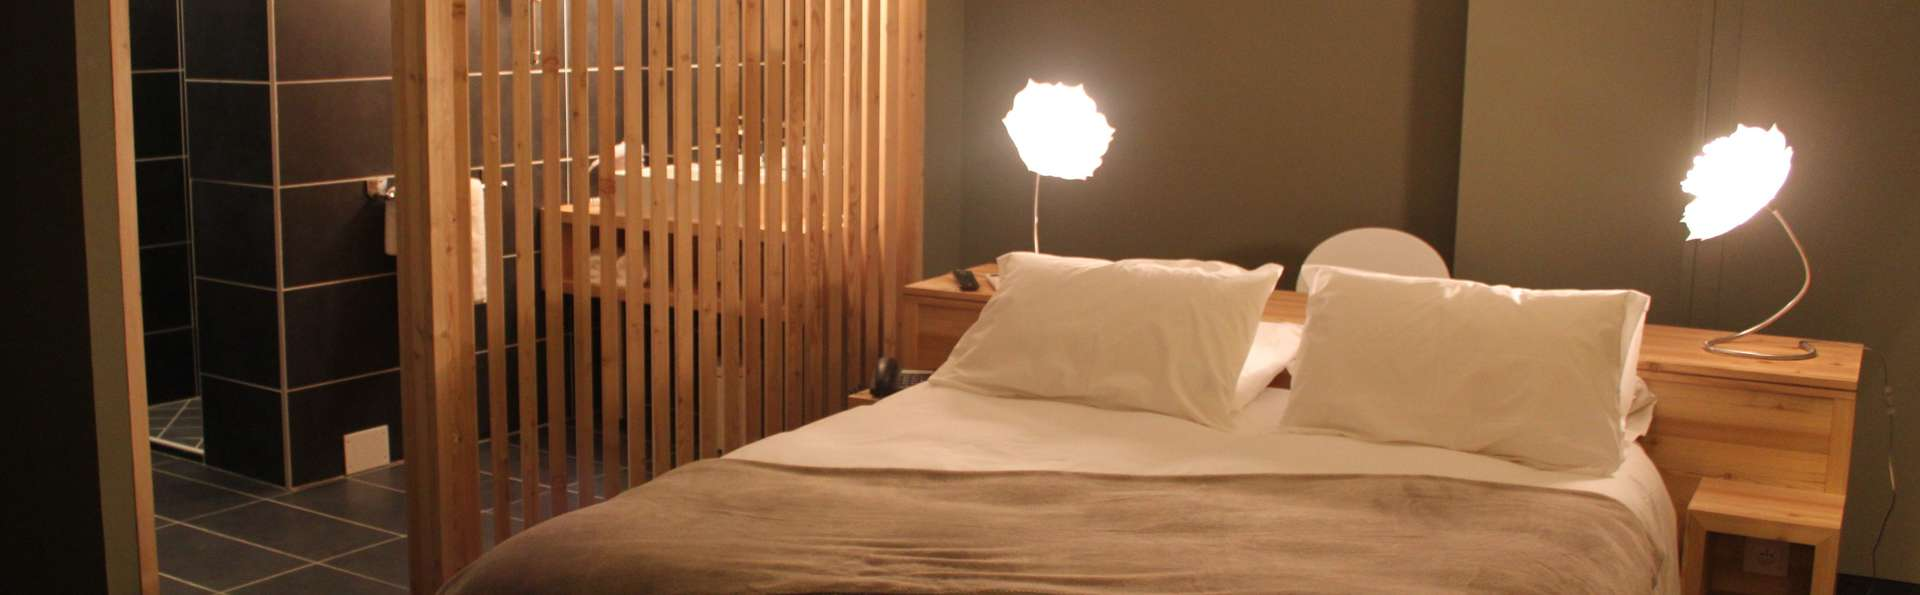 Mon Hôtel à Gap - MON_HOTEL_A_GAP__7_.JPG